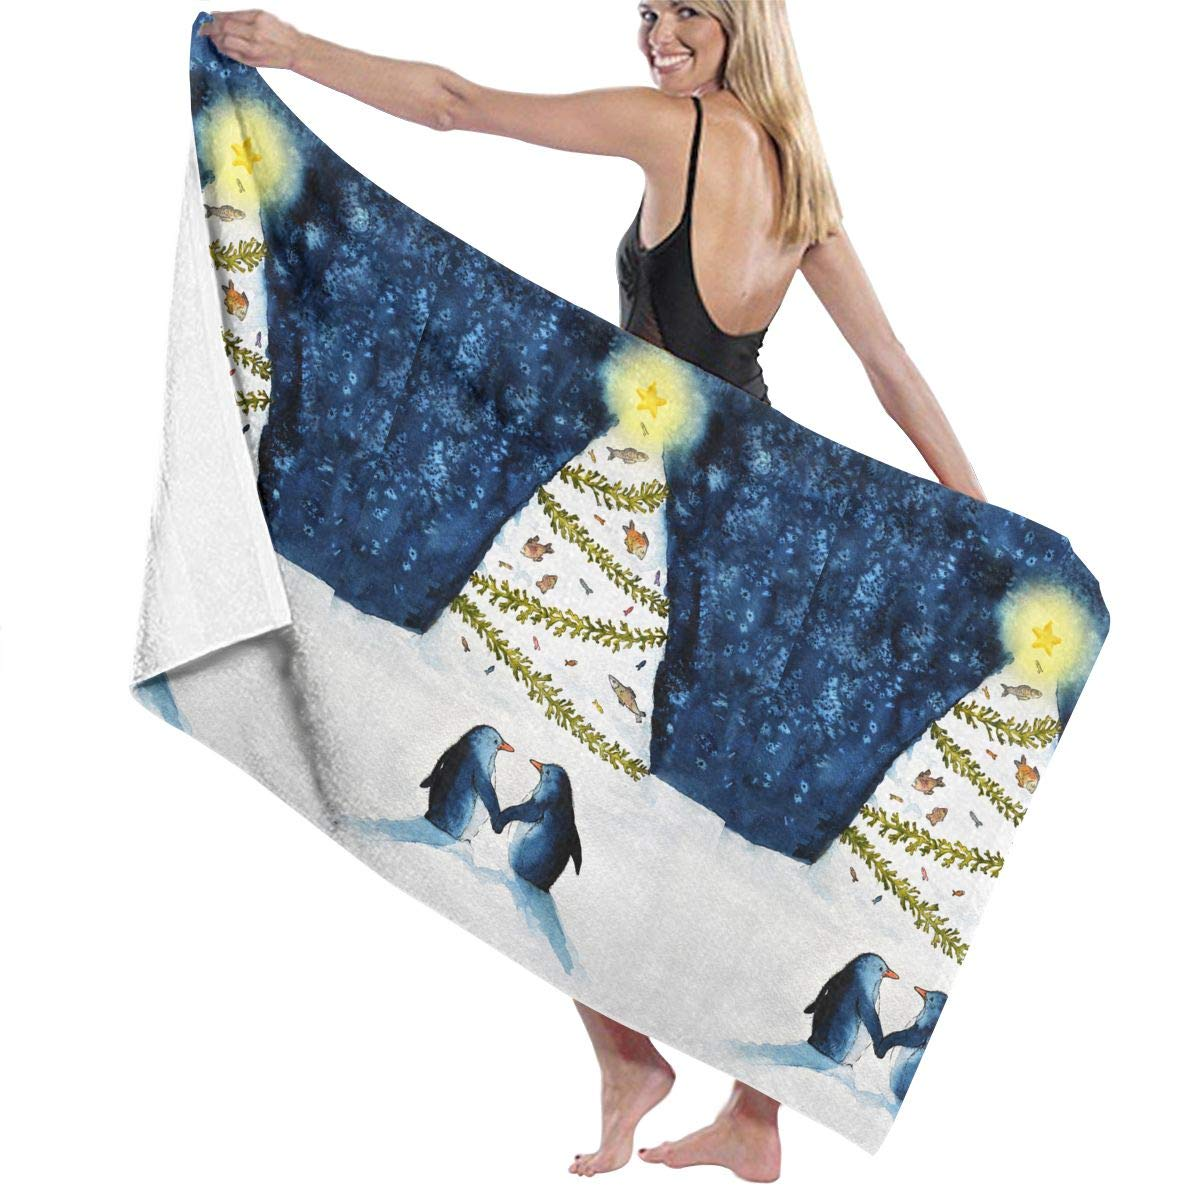 Amazon.com: QWED Penguin Christmas Unisex Luxury Beach ...